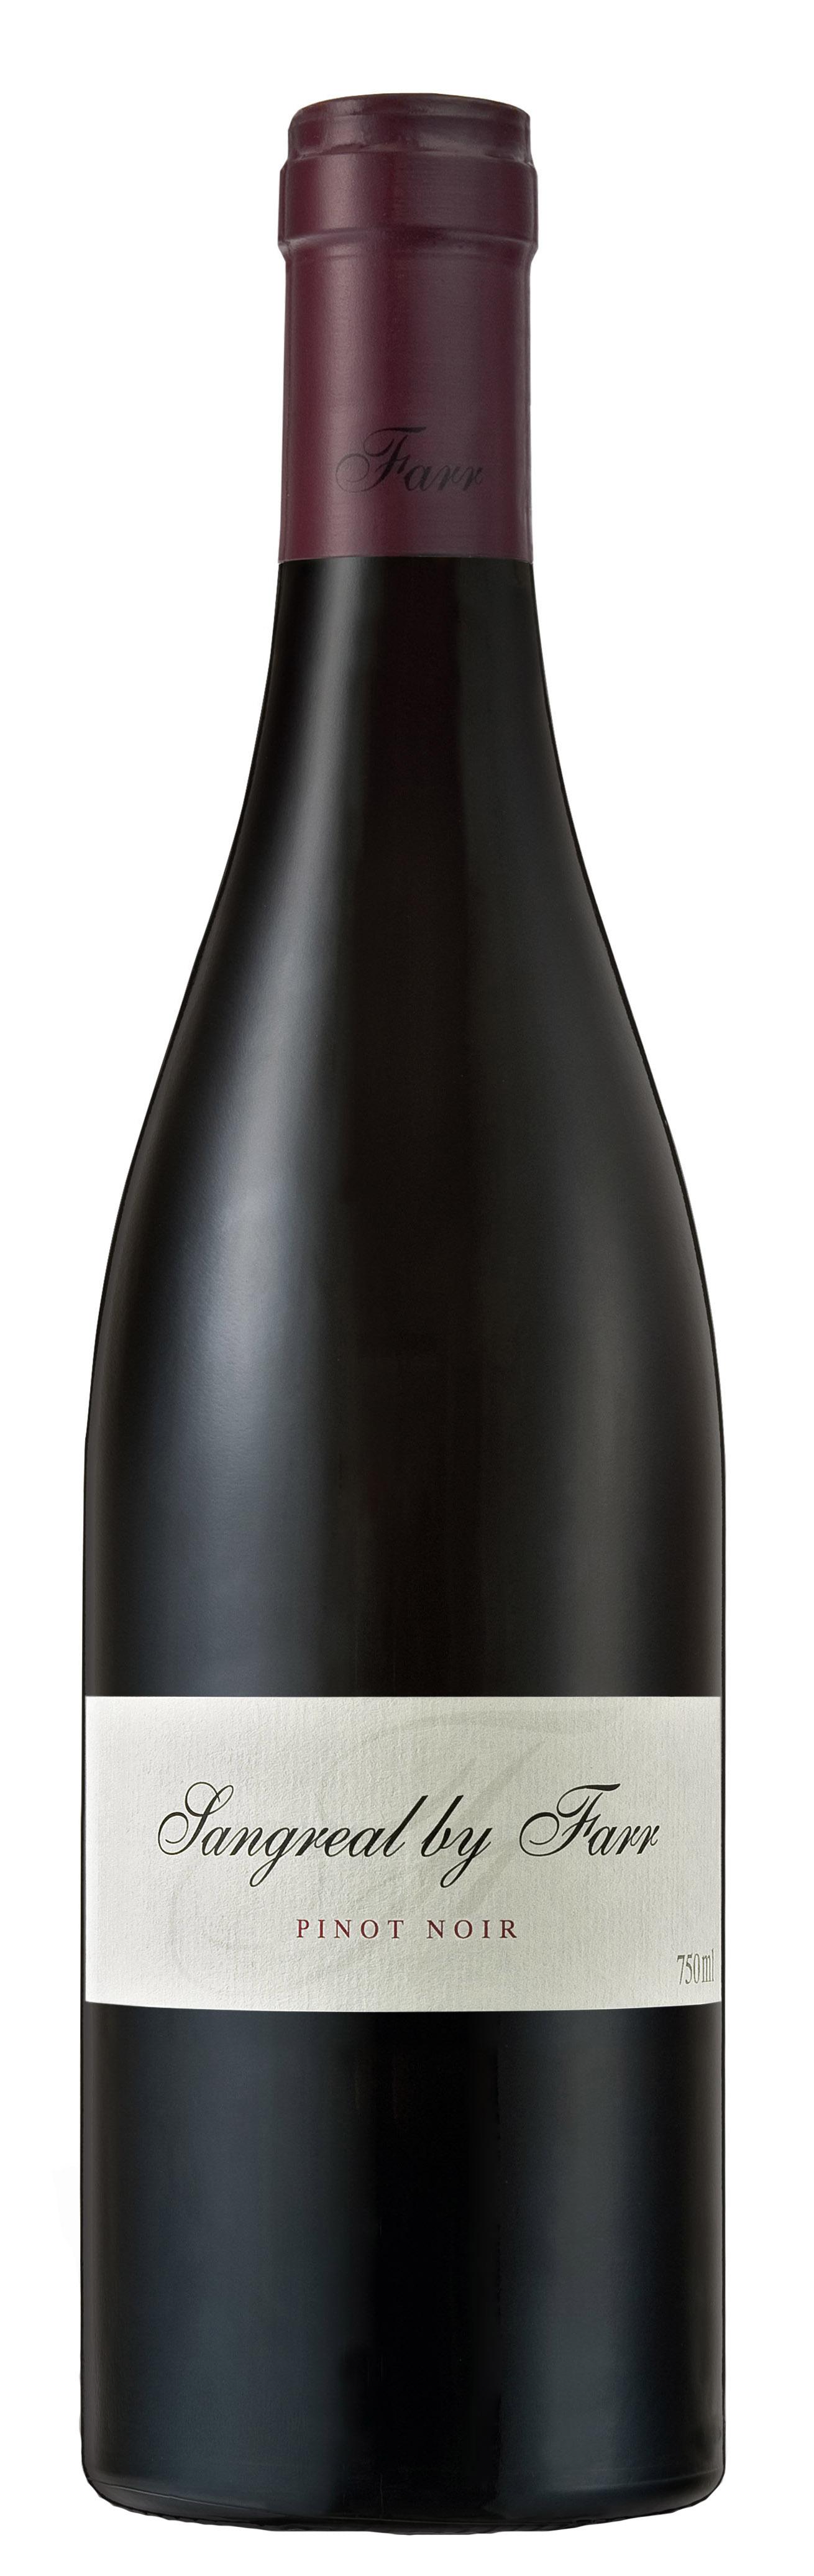 By Farr, `Sangreal` Geelong Pinot Noir 2015